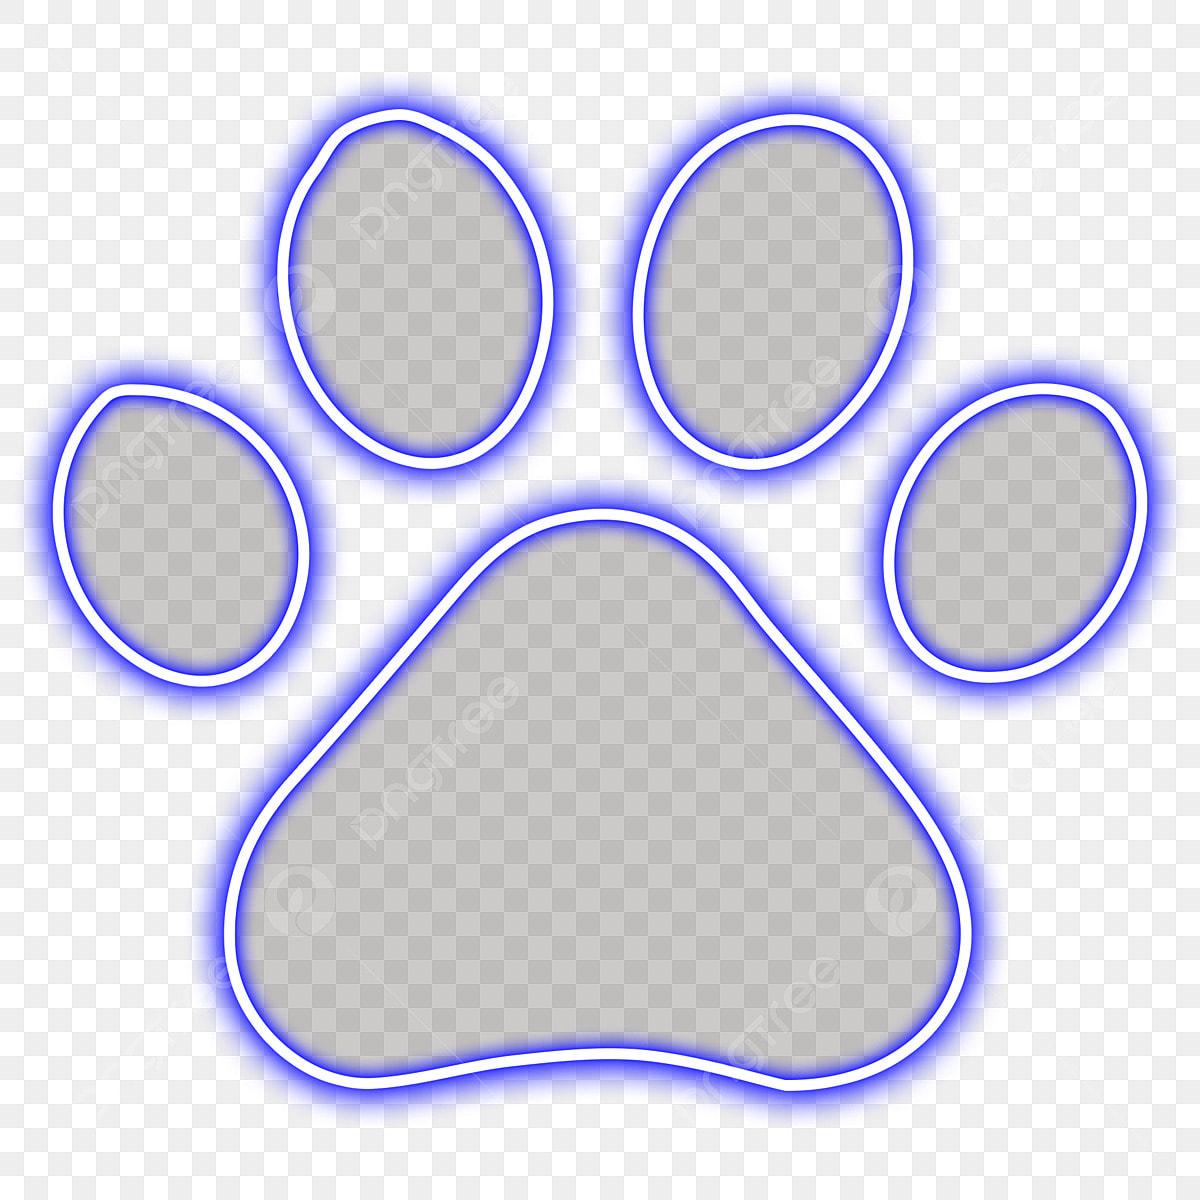 Azul Neón Animal Gato Huella Gato Gato Archivo Png Y Psd